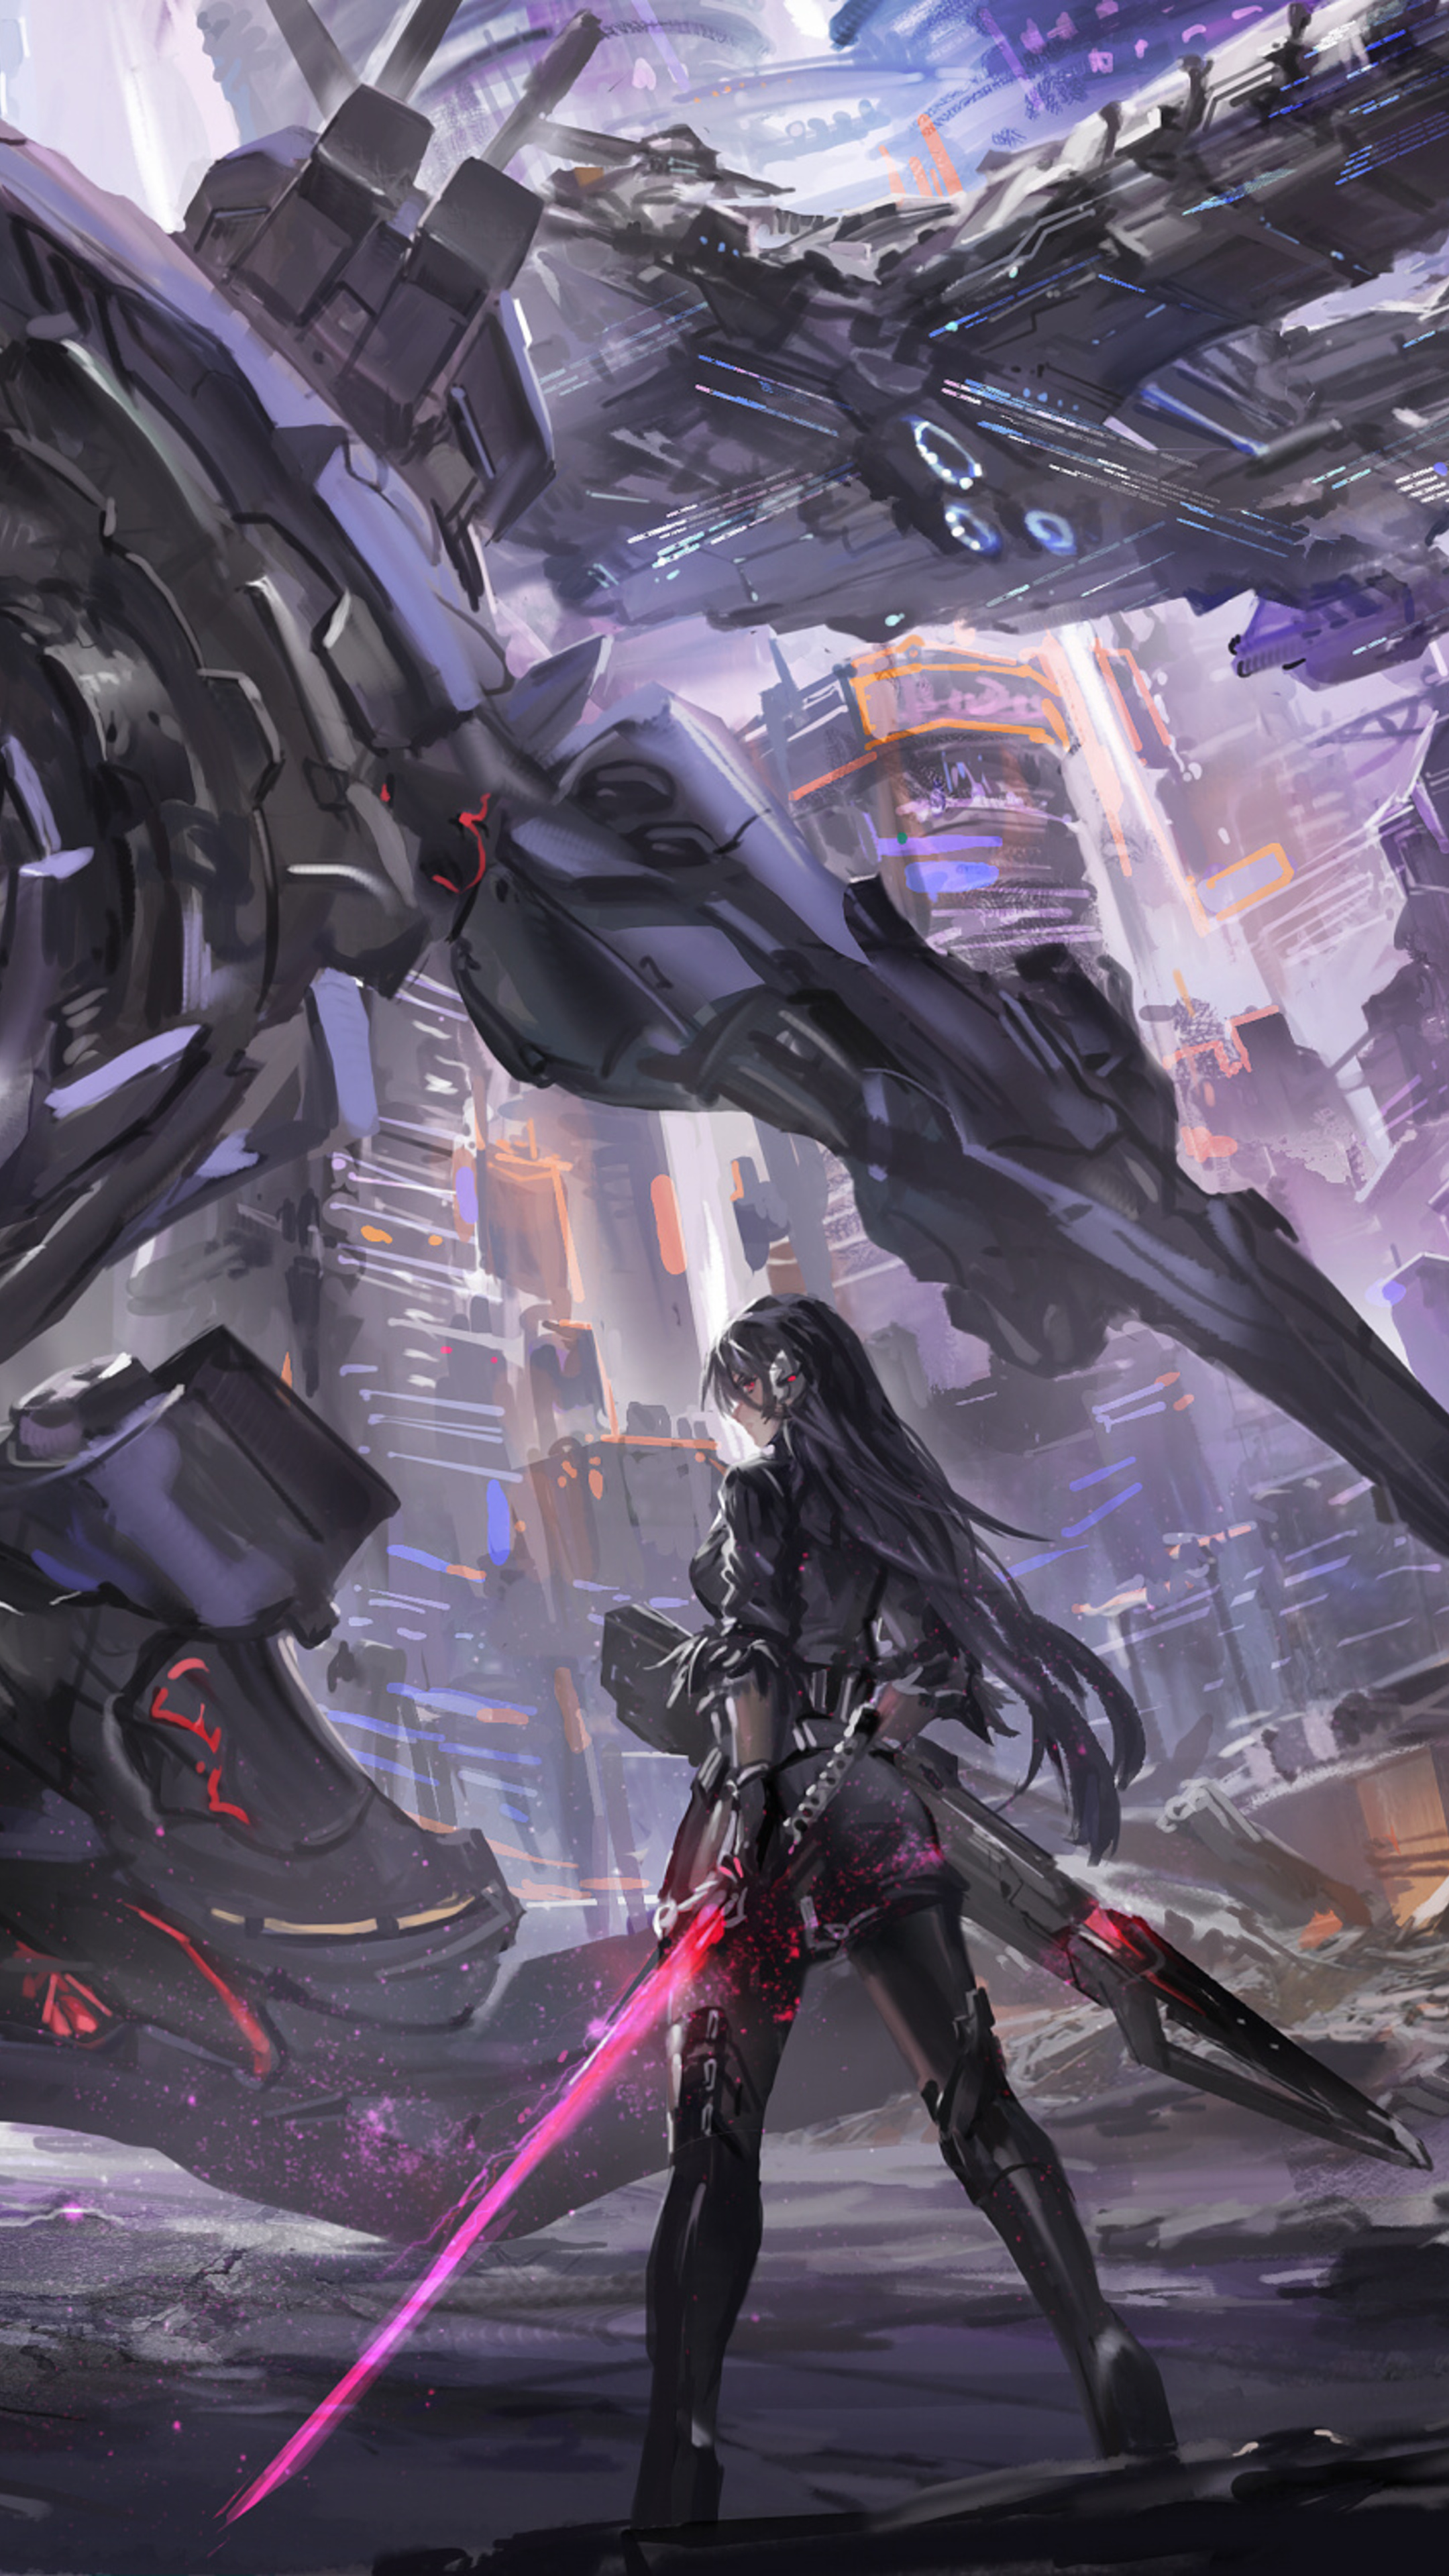 2160x3840 robot scifi anime war sony xperia x xz z5 - Anime war wallpaper ...